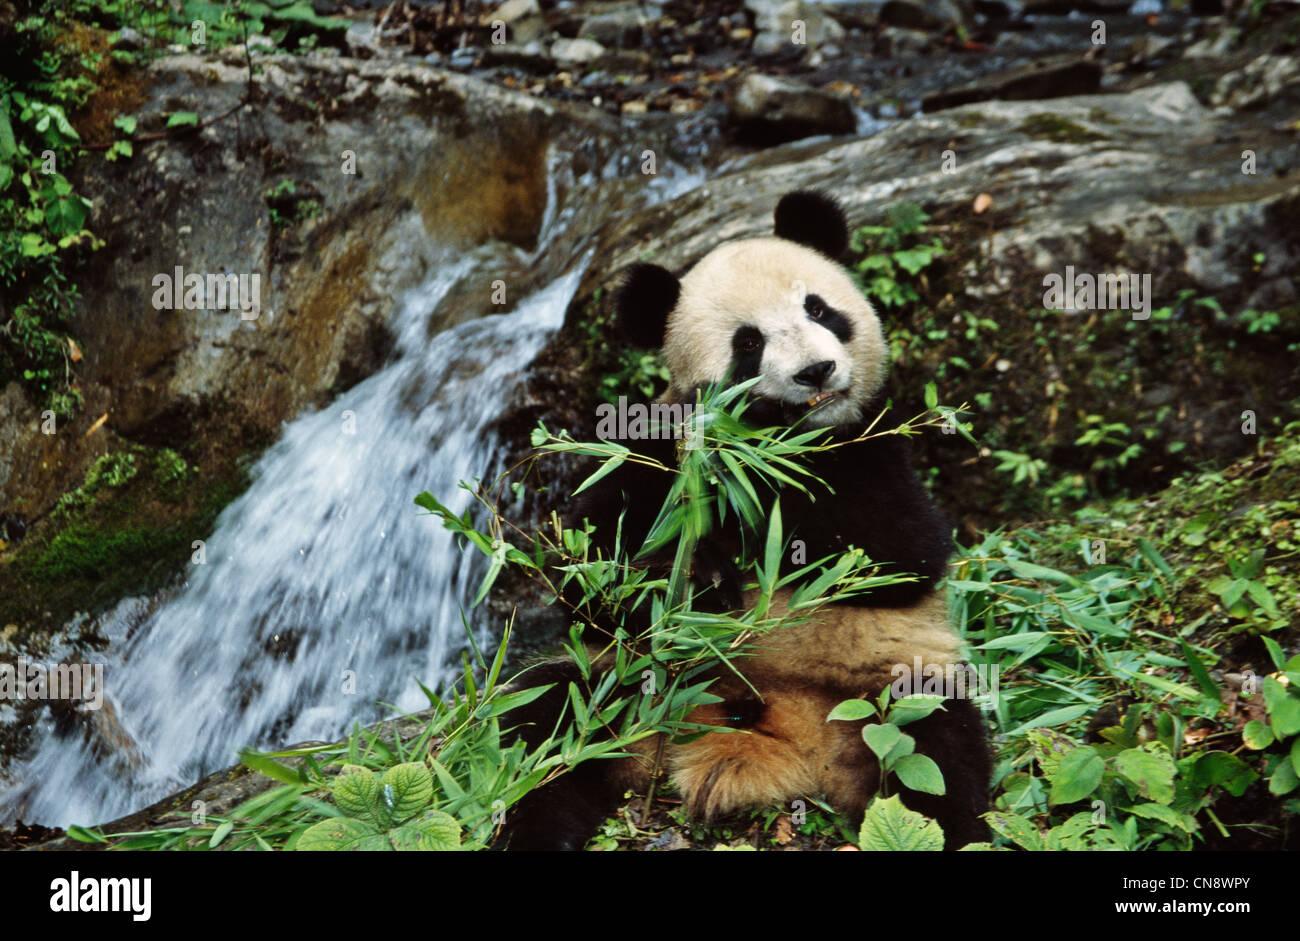 Giant Panda Cub Essen Bambus Am Wasserfall Wolong Sichuan China